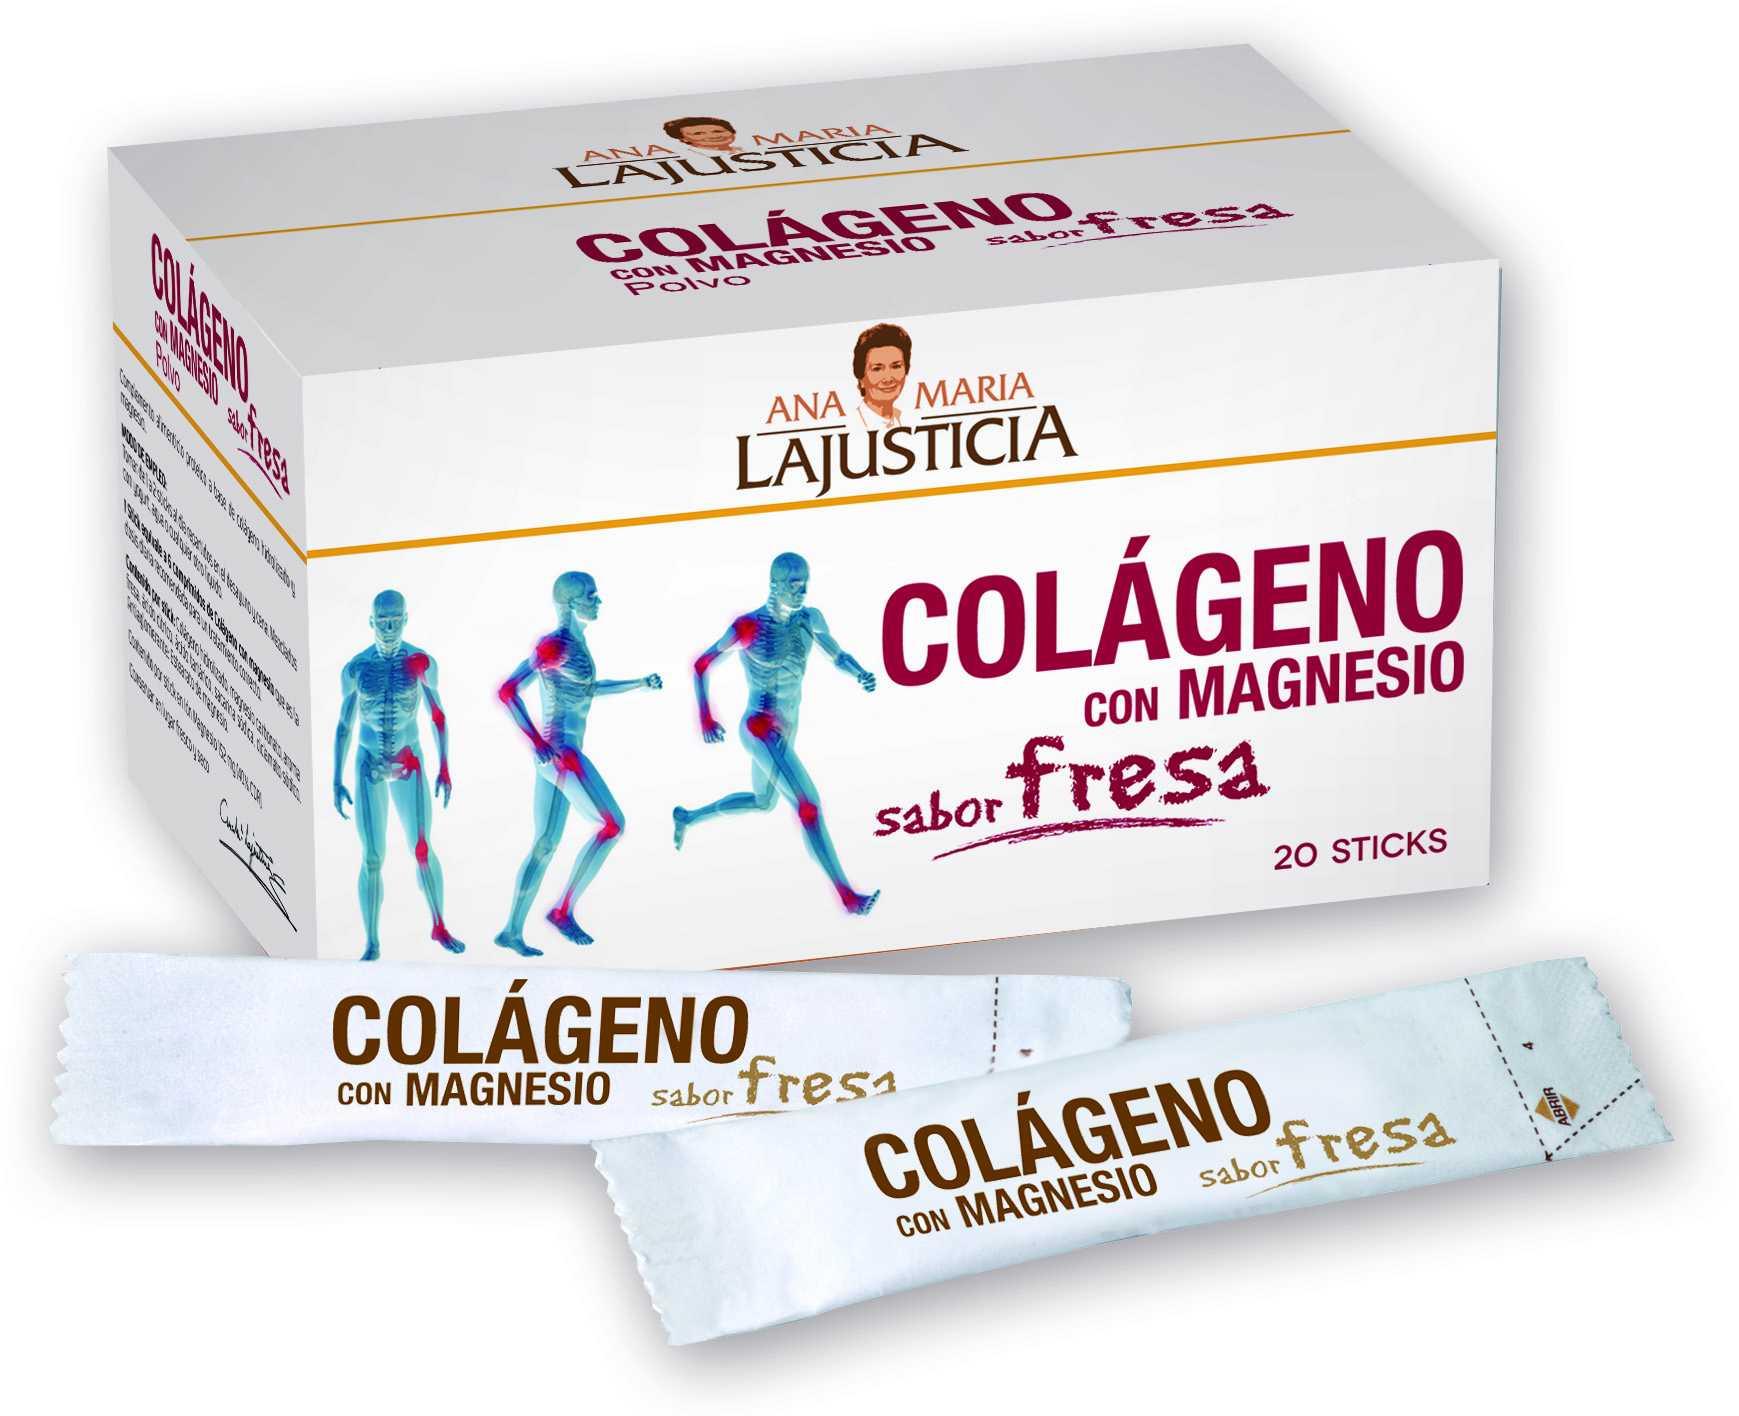 Ana Maria Lajusticia Colágeno con Magnesio Fresa 20 sticks